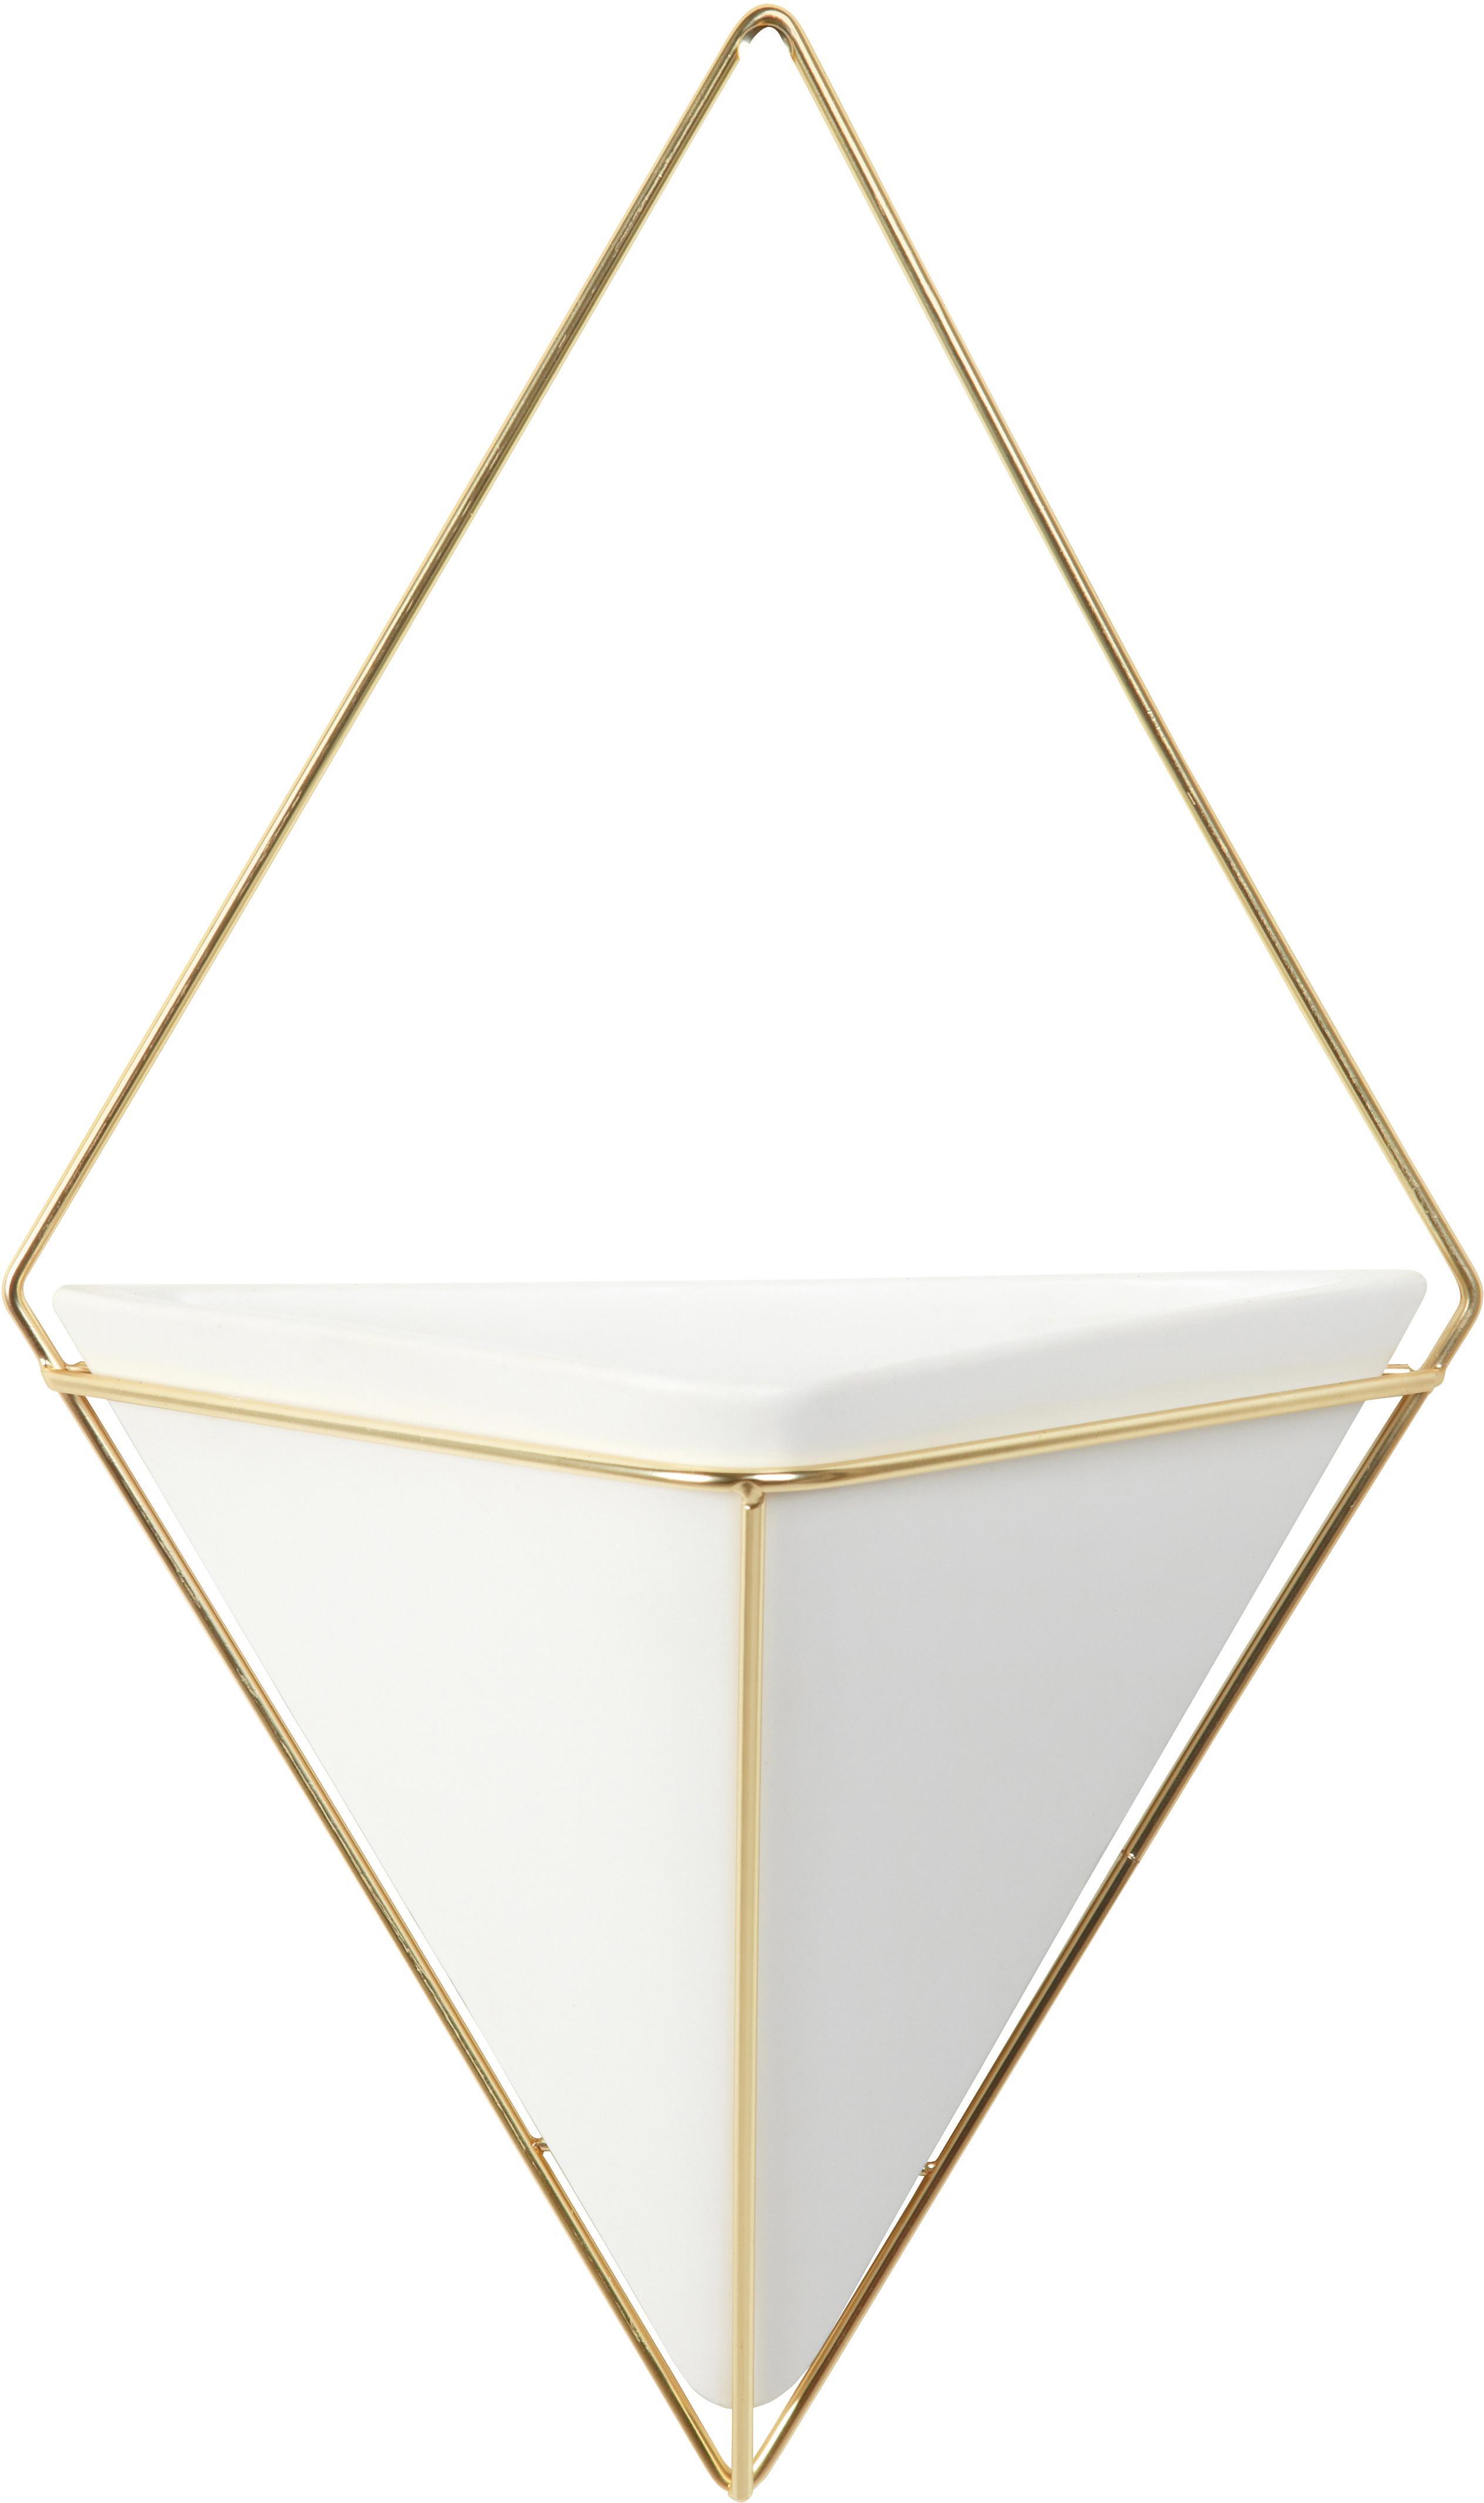 Portavaso da parete in ceramica Trigg, Bianco, ottone opaco, Larg. 23 x Alt. 38 cm